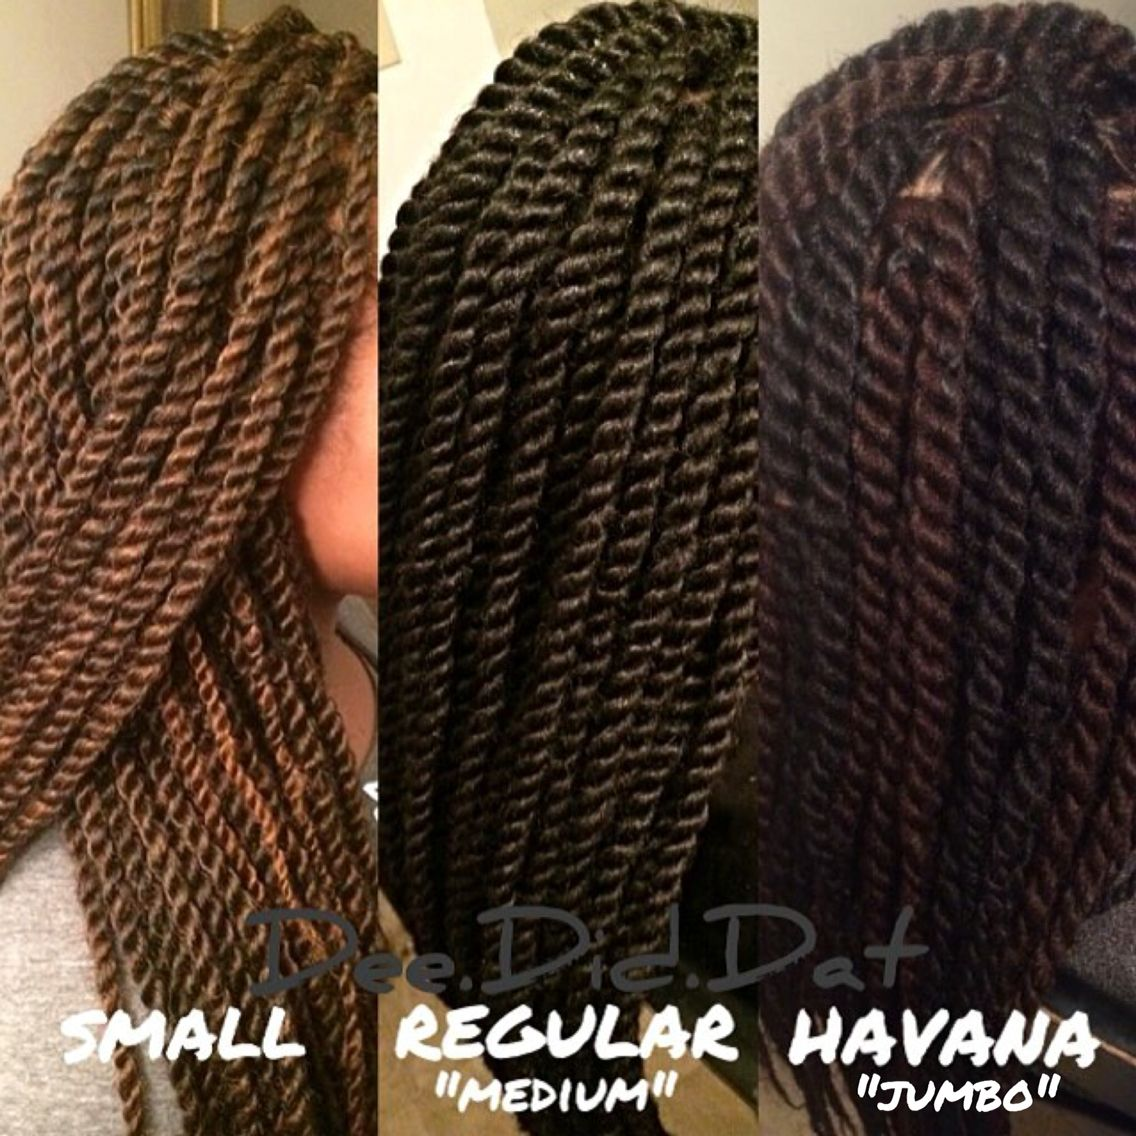 Sizechart For Marley Twists Protective Styles Jpg 1136x1136 Braid Size Chart